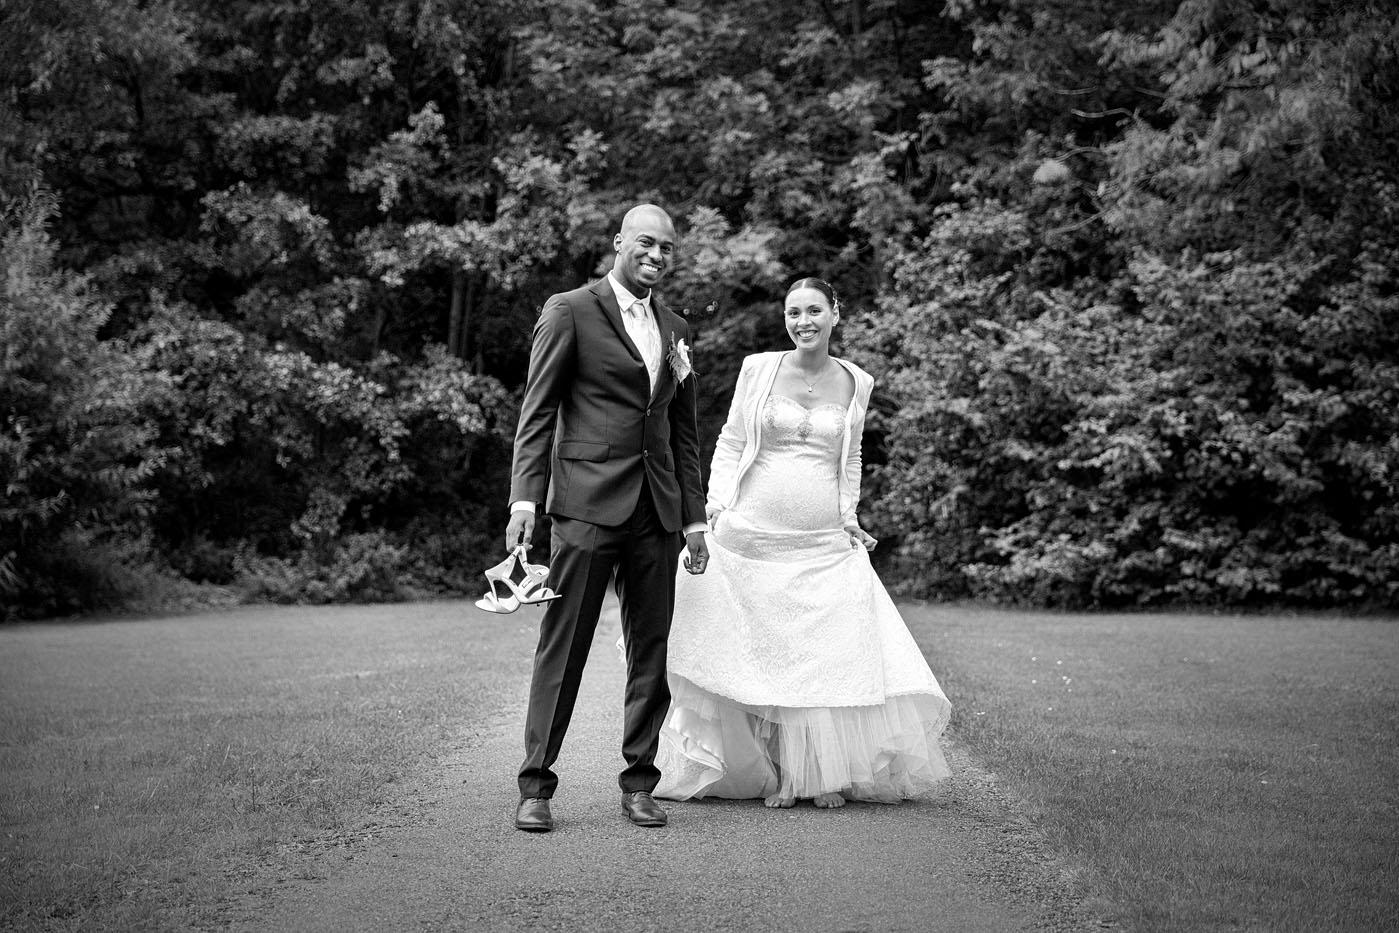 bruiloft-wedding-trouwen-rotterdam-fotograaf-bobhersbach-blotevoeten